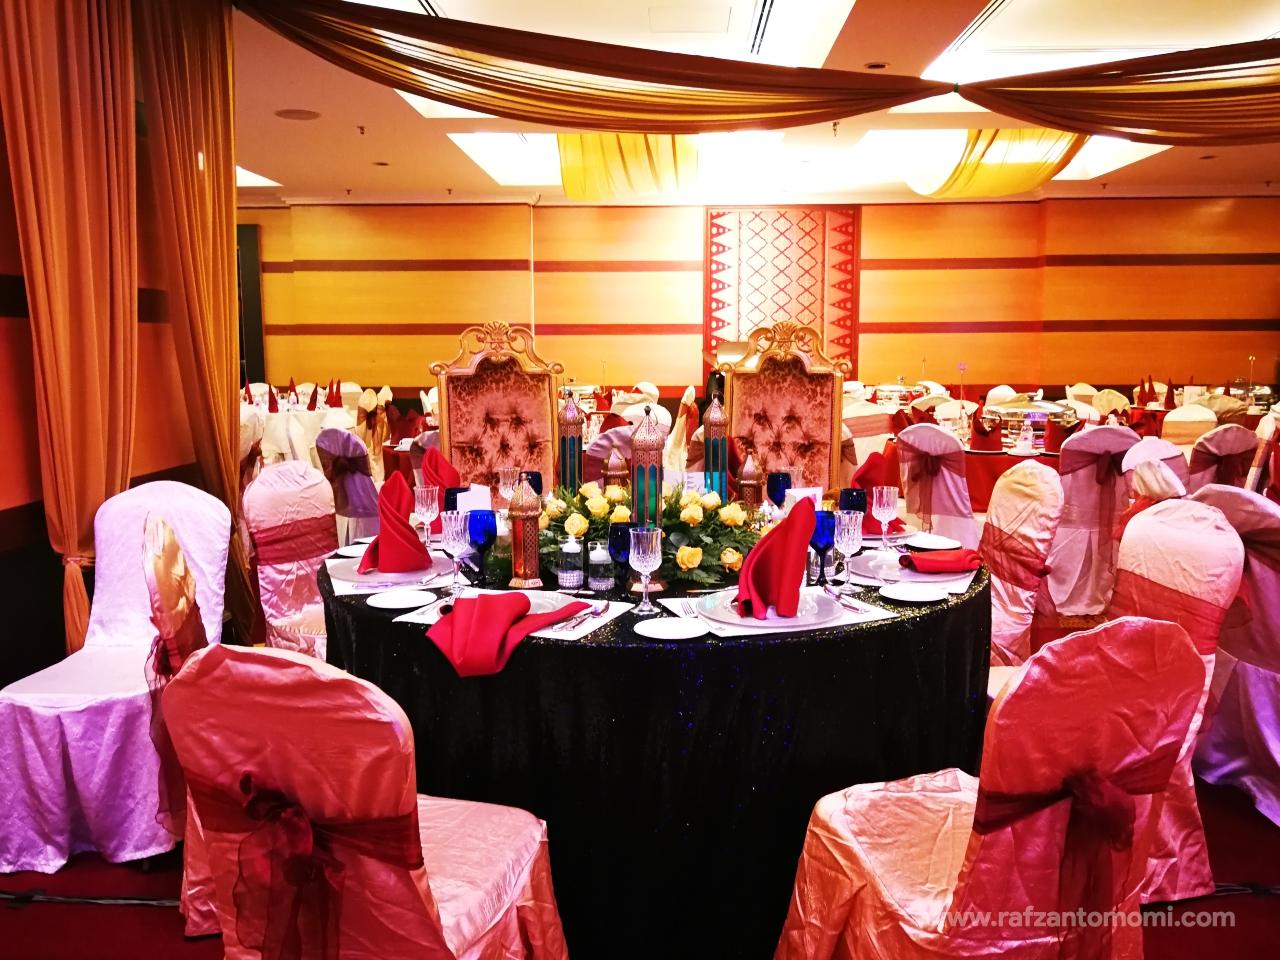 Dewan Besar Tun Rahah Kuala Lumpur